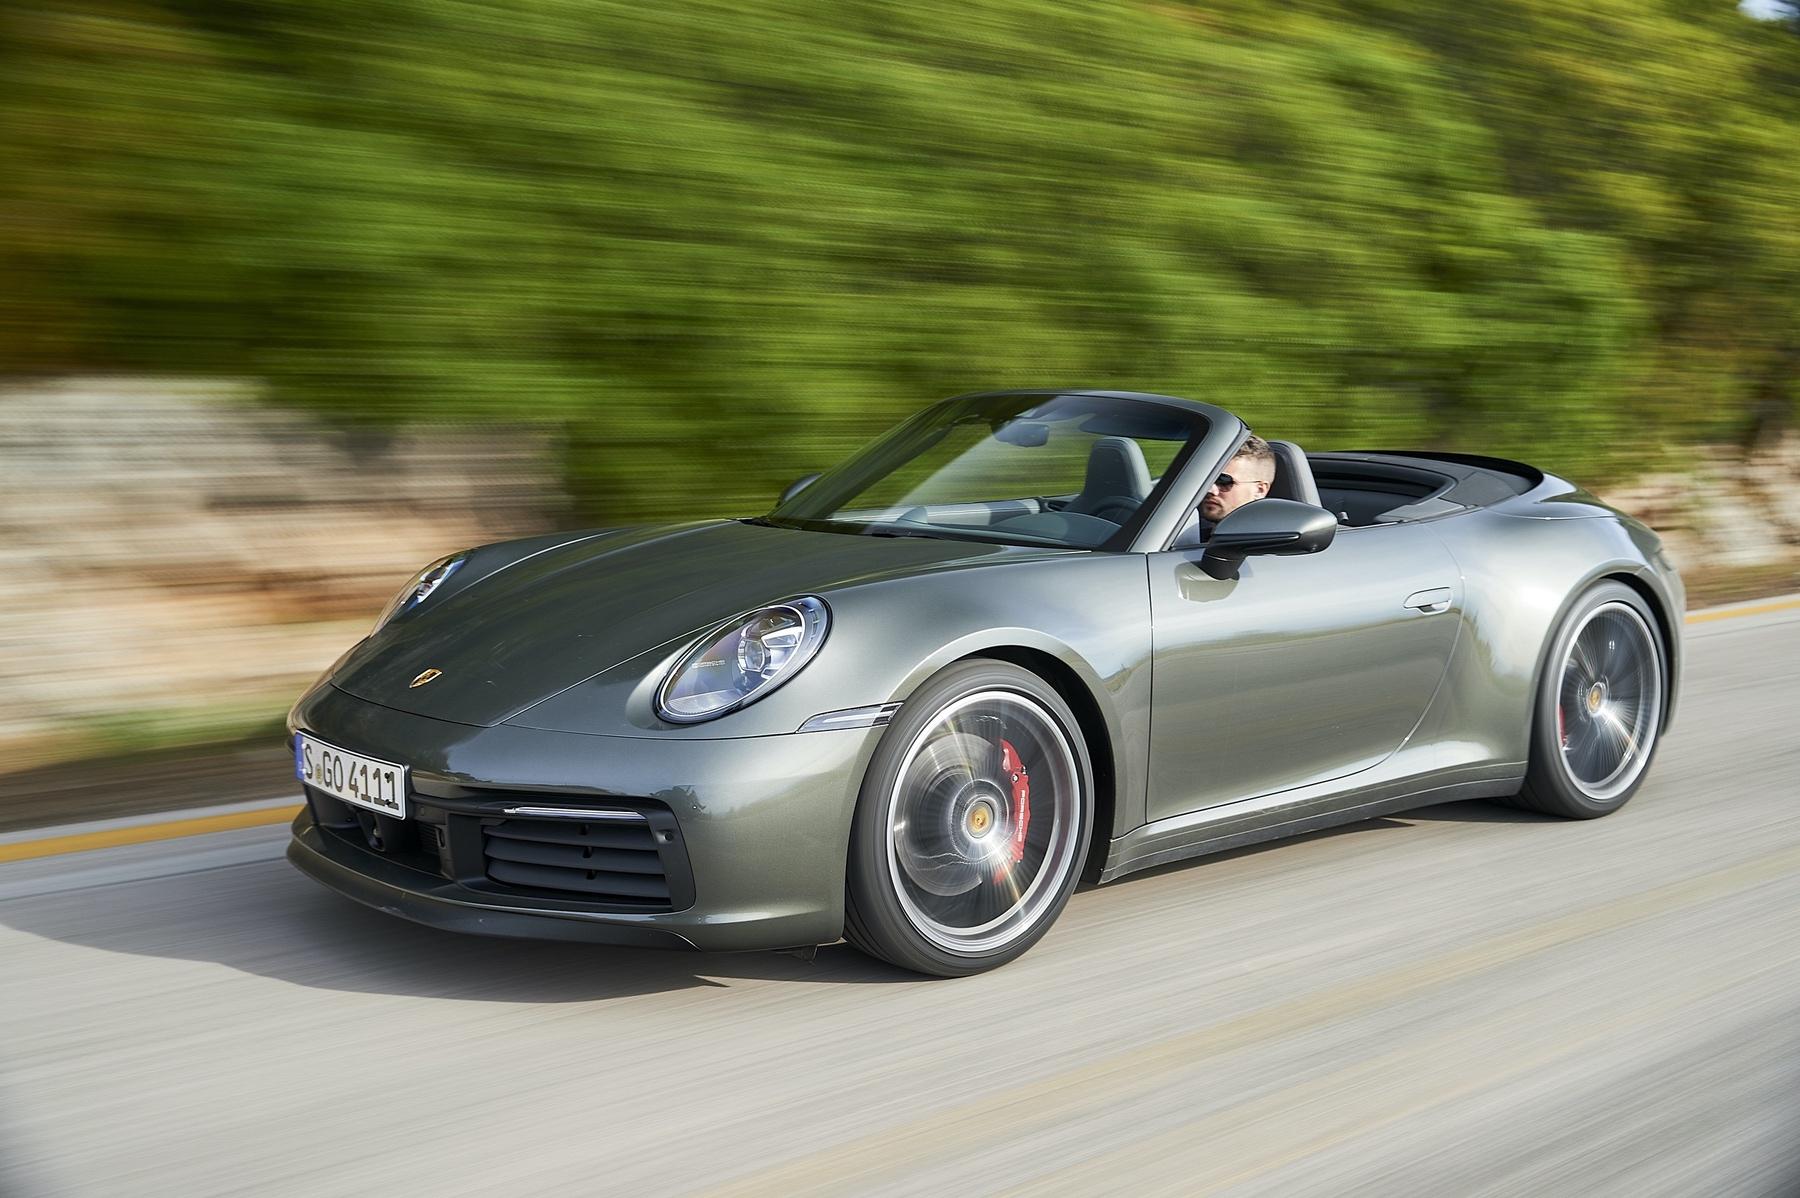 Test_Drive_Porsche_911_Athens_0104